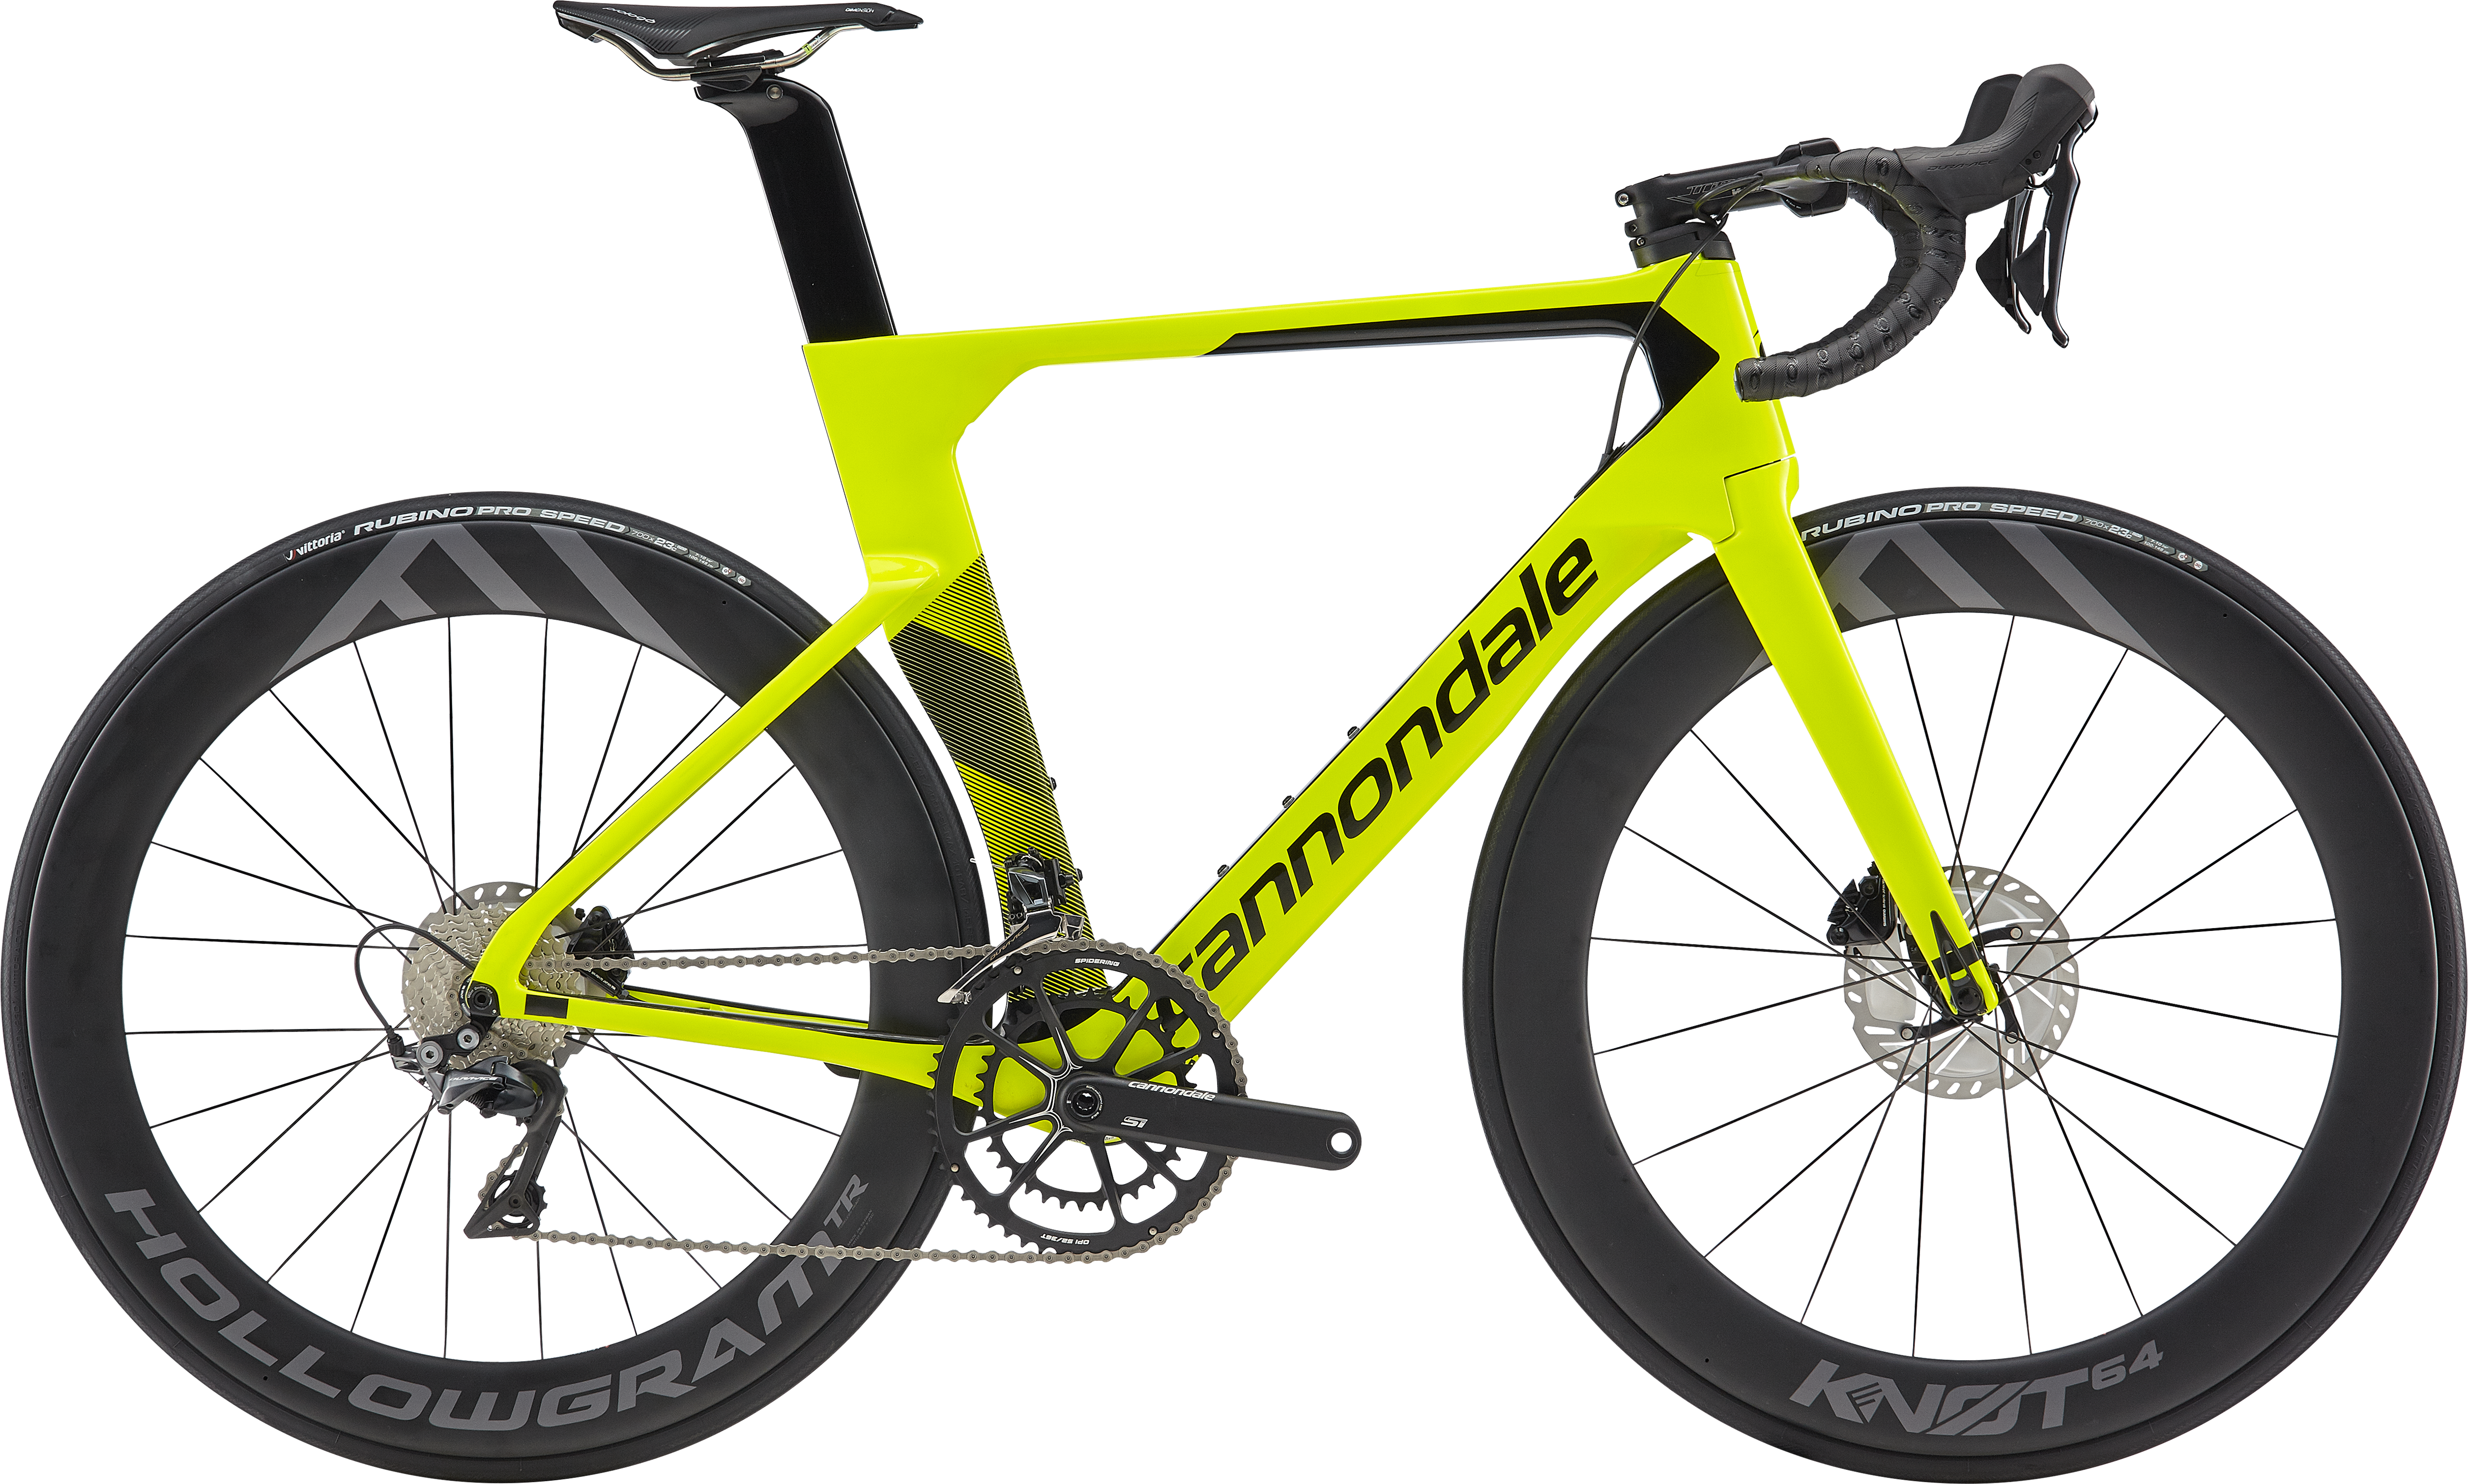 Fastest Road Bike >> Chinetti Triathlon Cycling Crossfit Fastest Road Bike Road